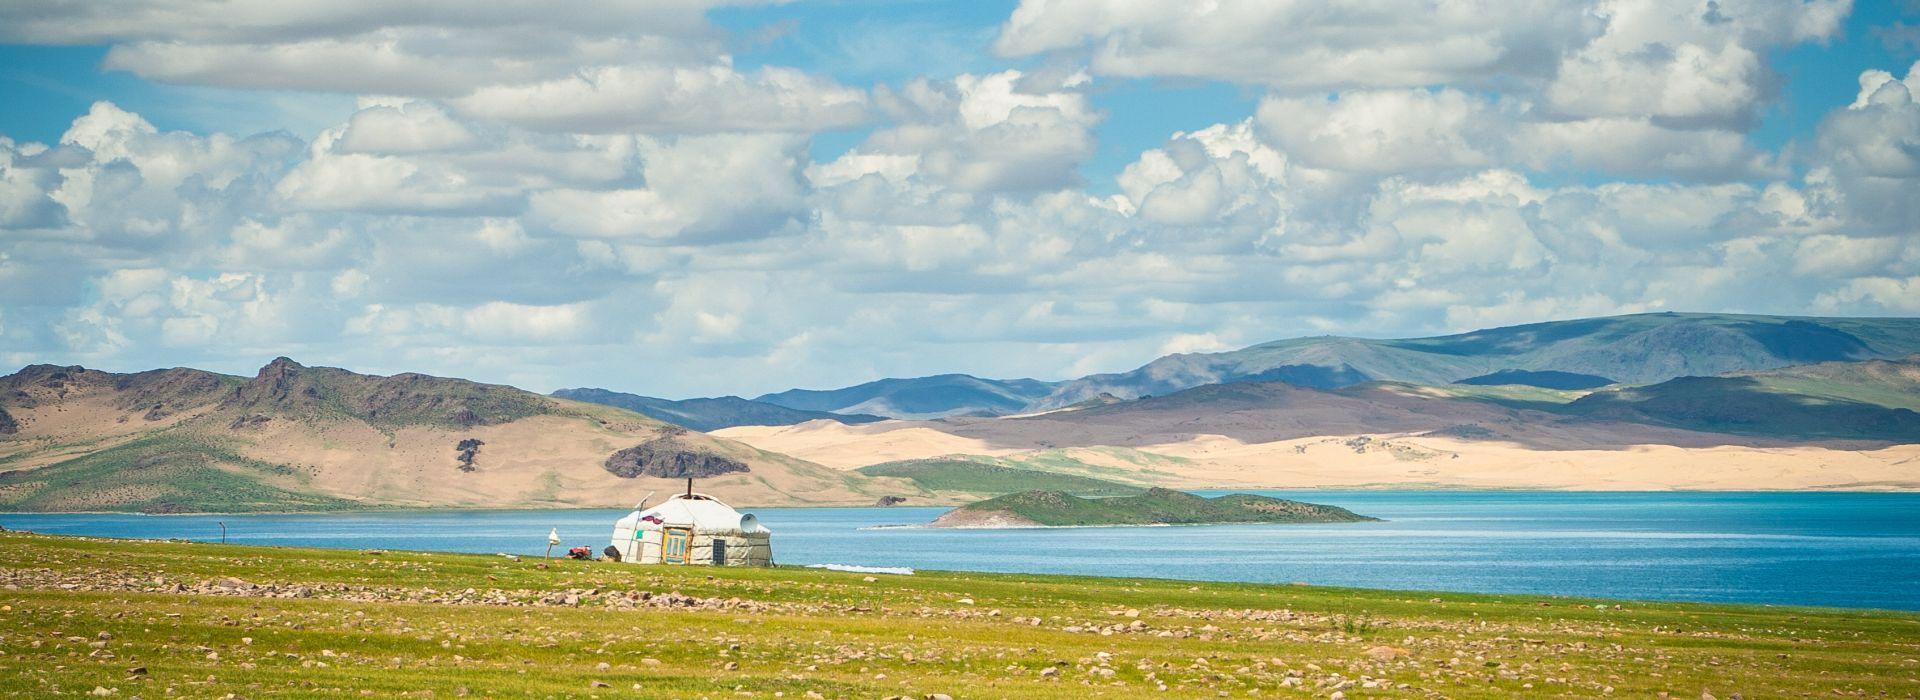 Ulaanbaatar Tours